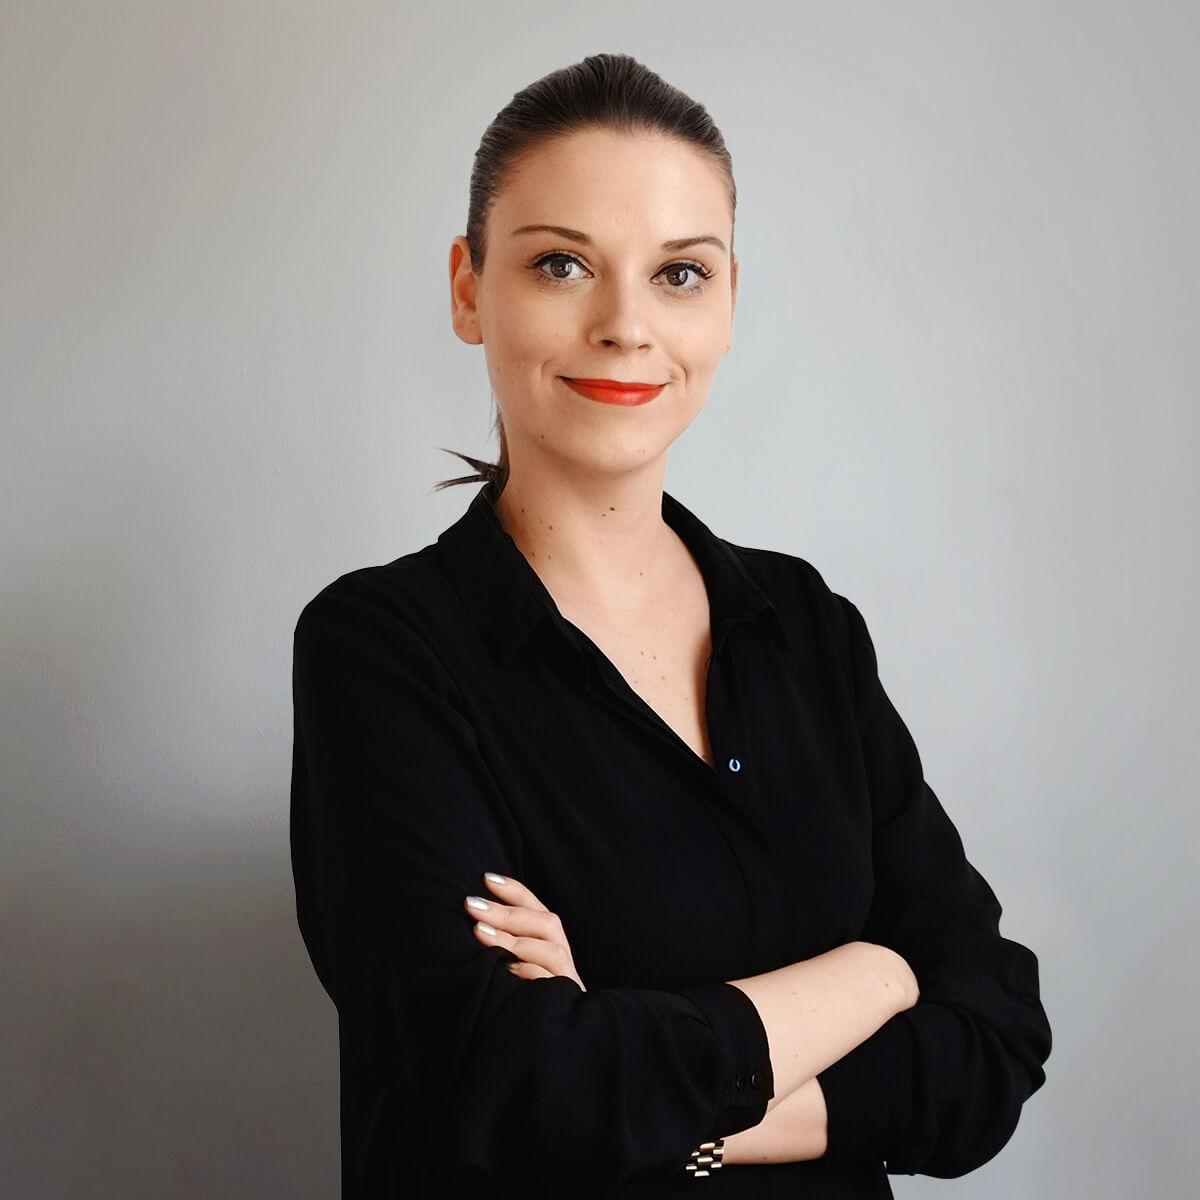 Victoria Tuzimek